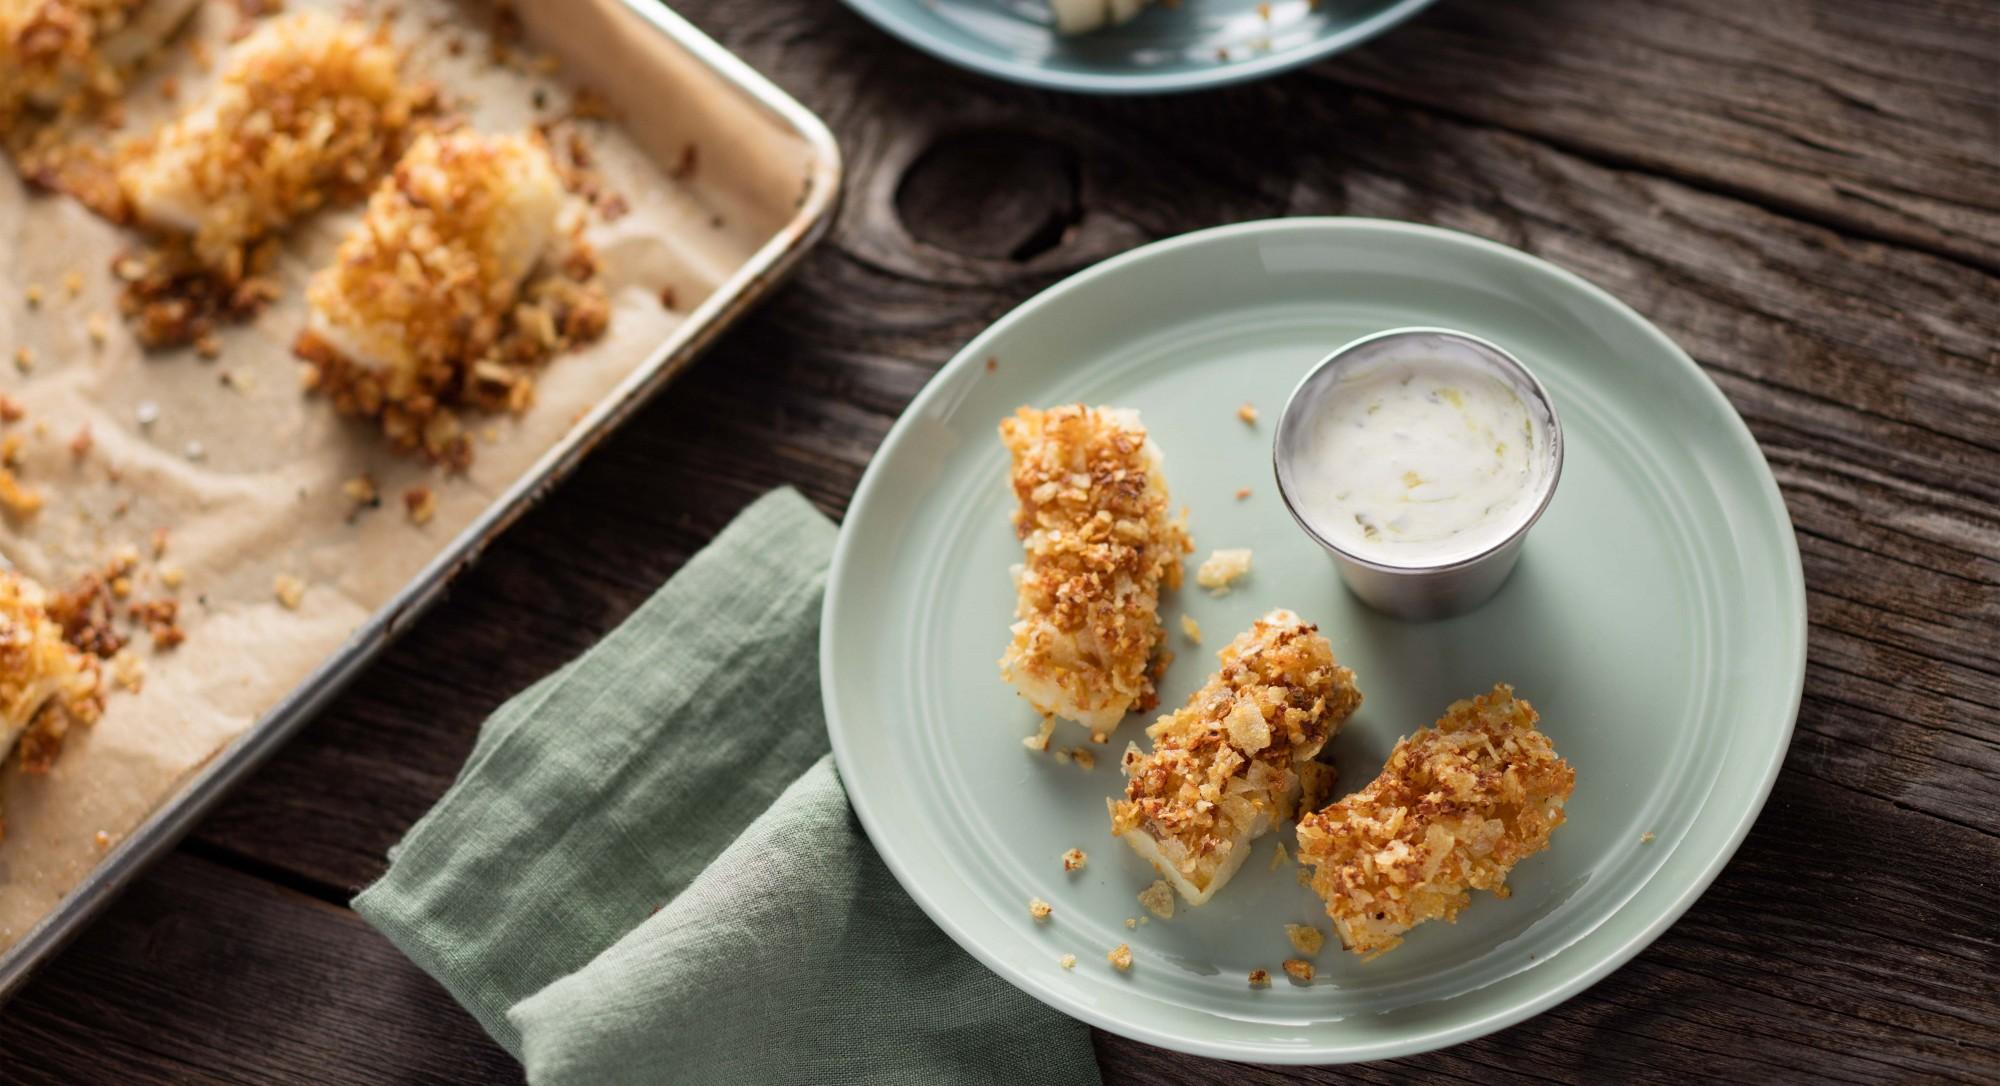 Gluten-Free Fish Sticks Recipe